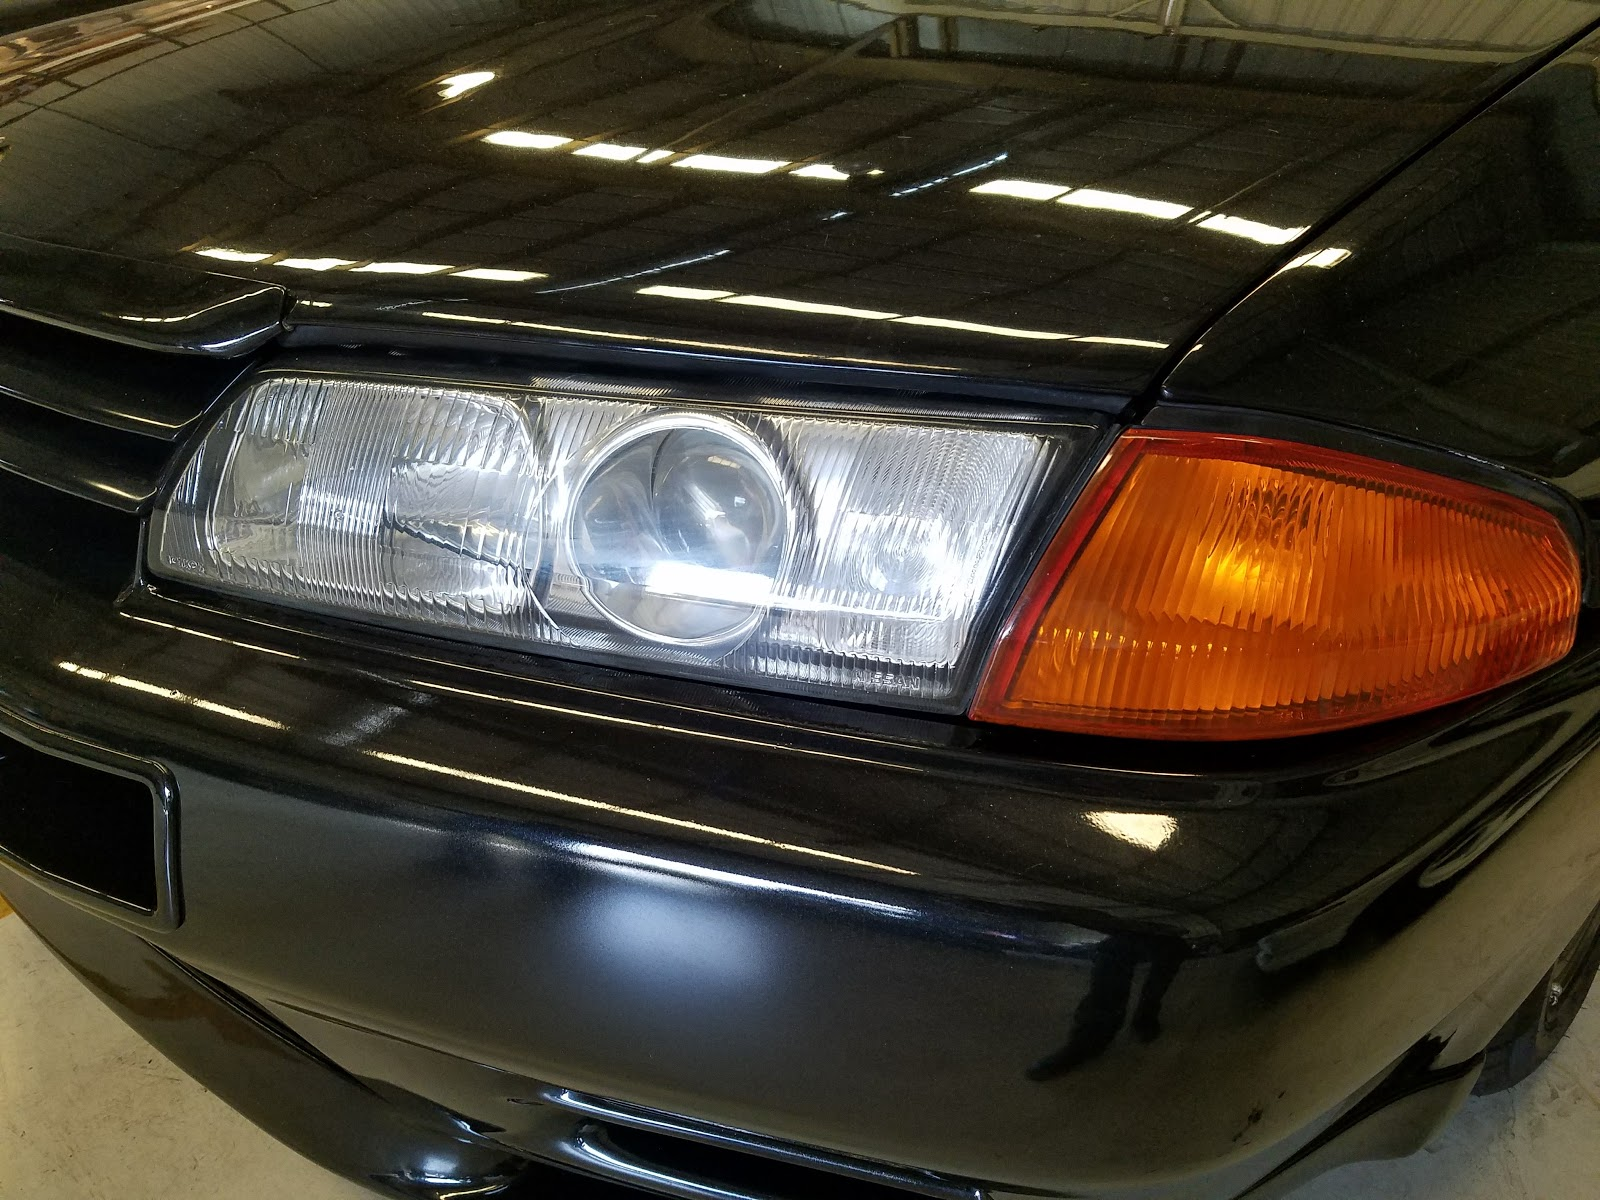 R33 Skyline Headlight Wiring Diagram Bmw E38 Dsp Nissan Gt R S In The Usa Blog